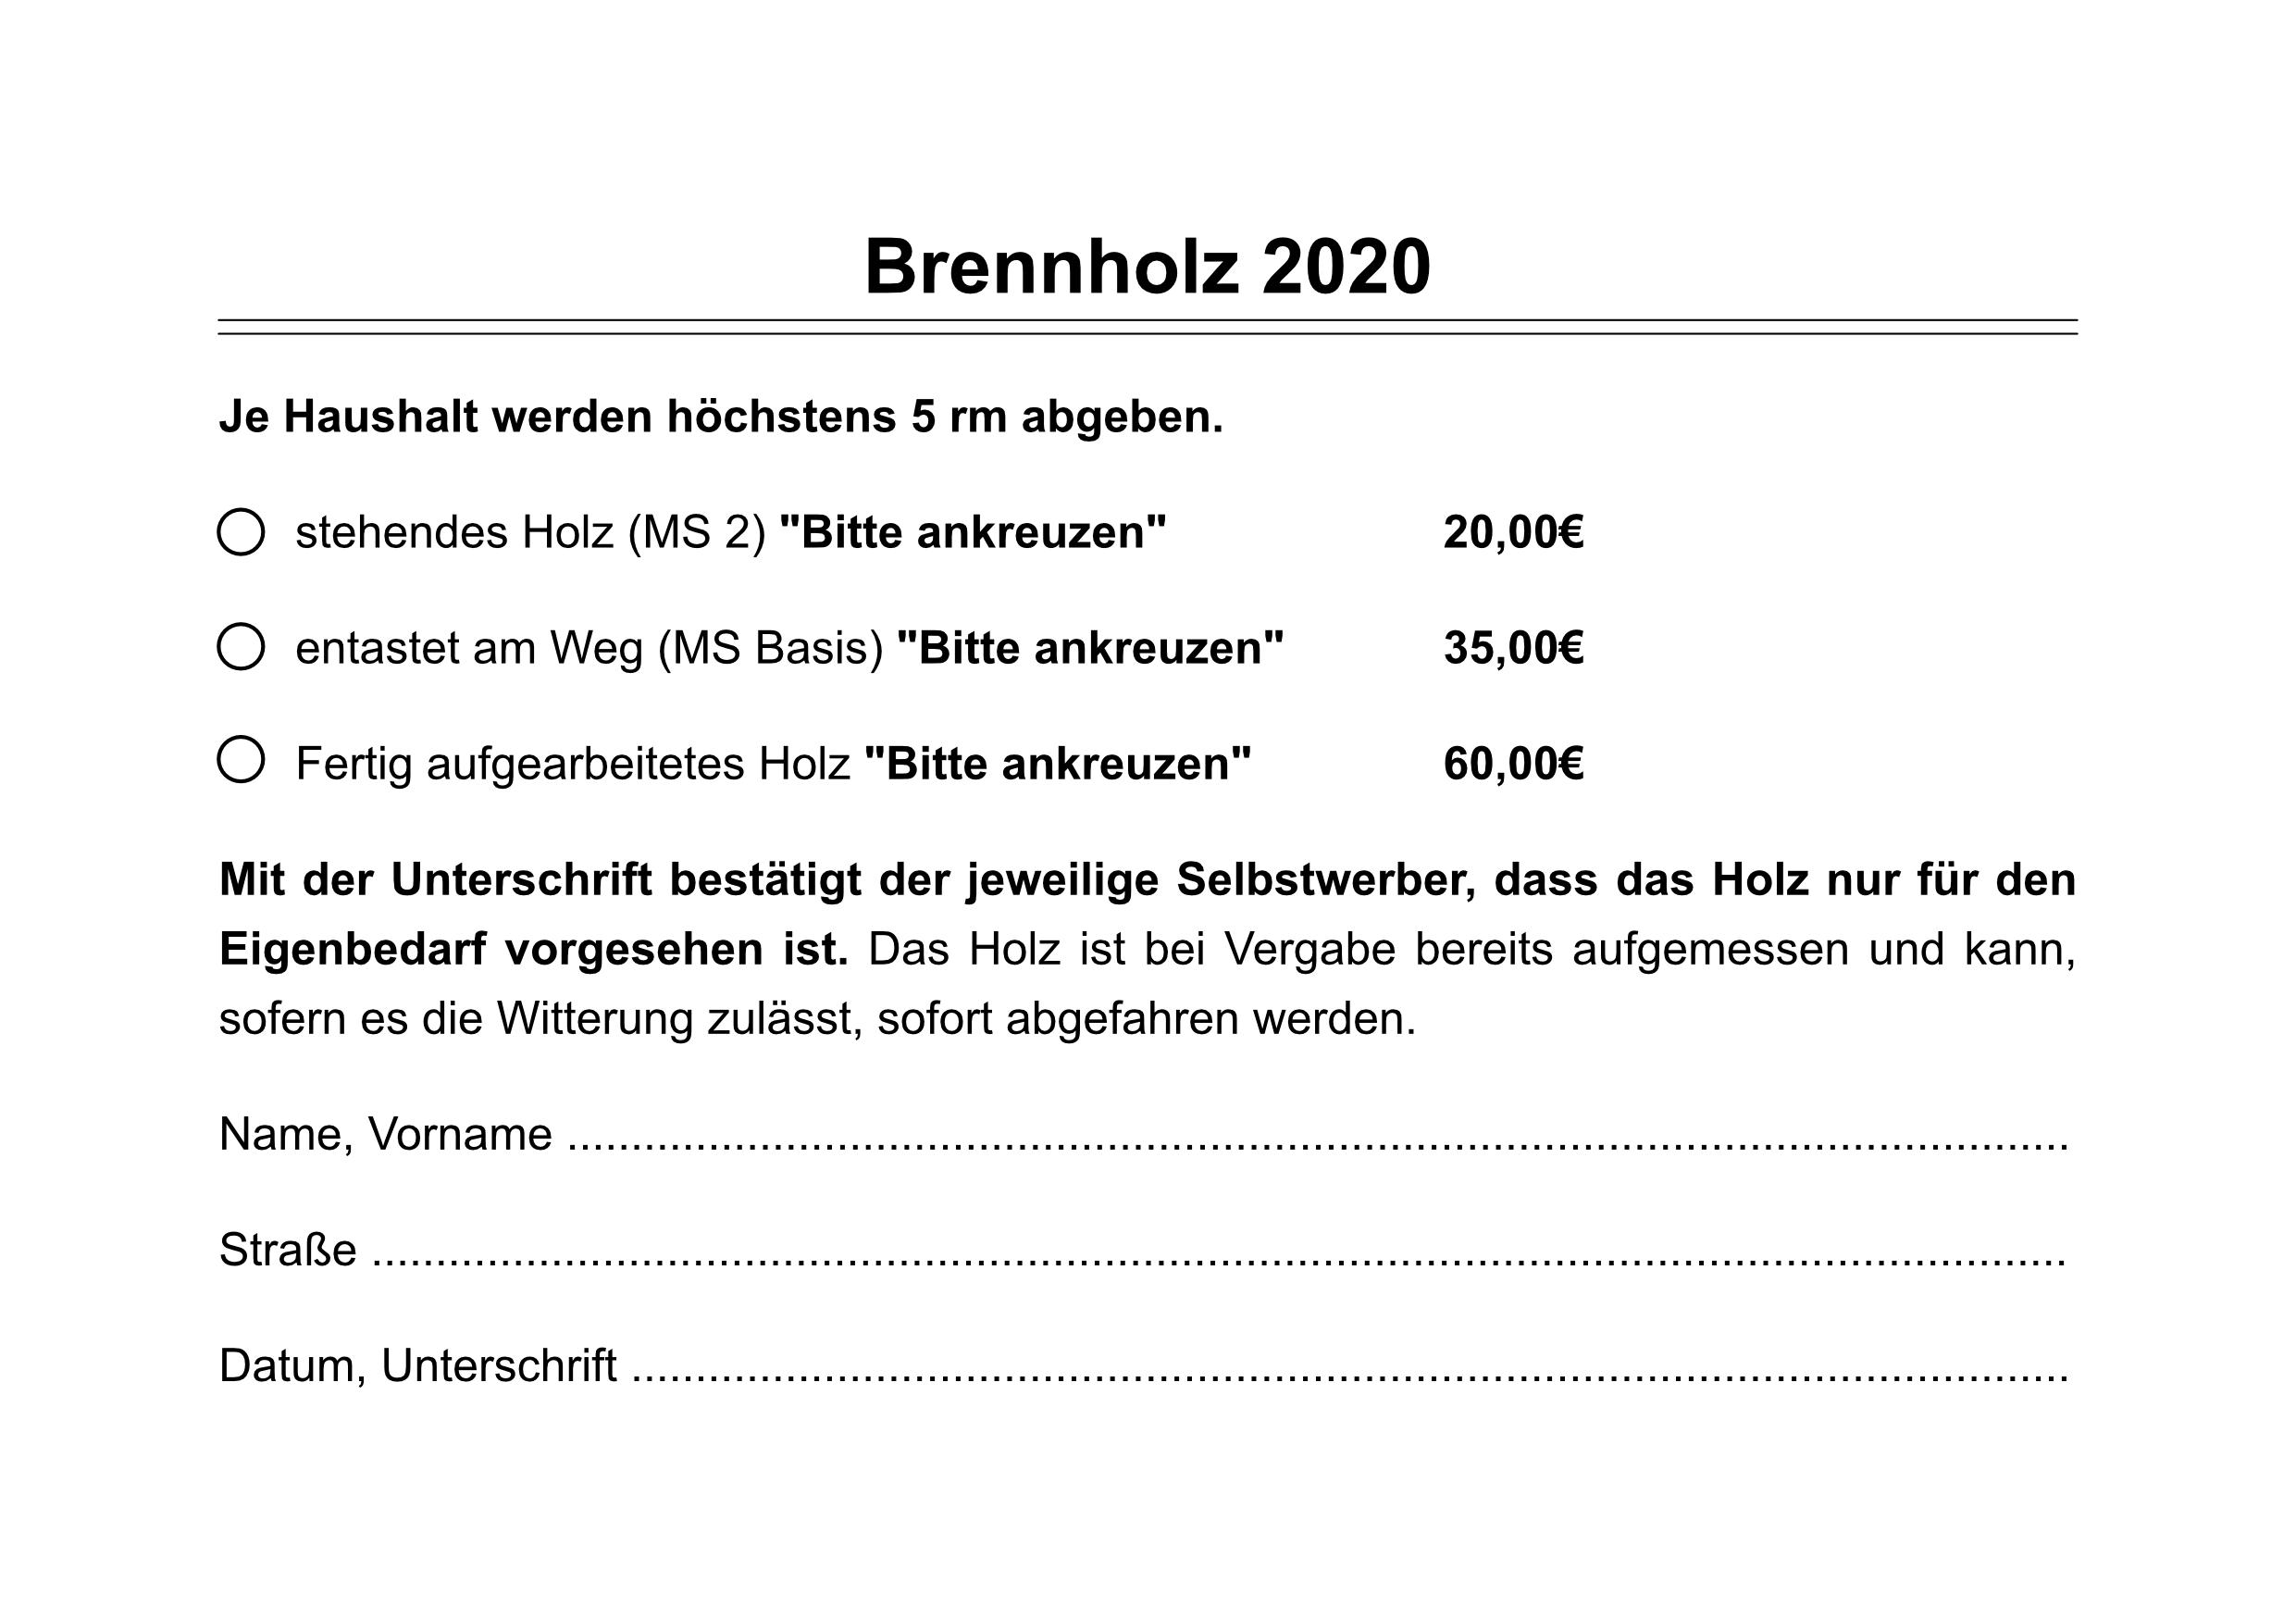 brennholz-2020